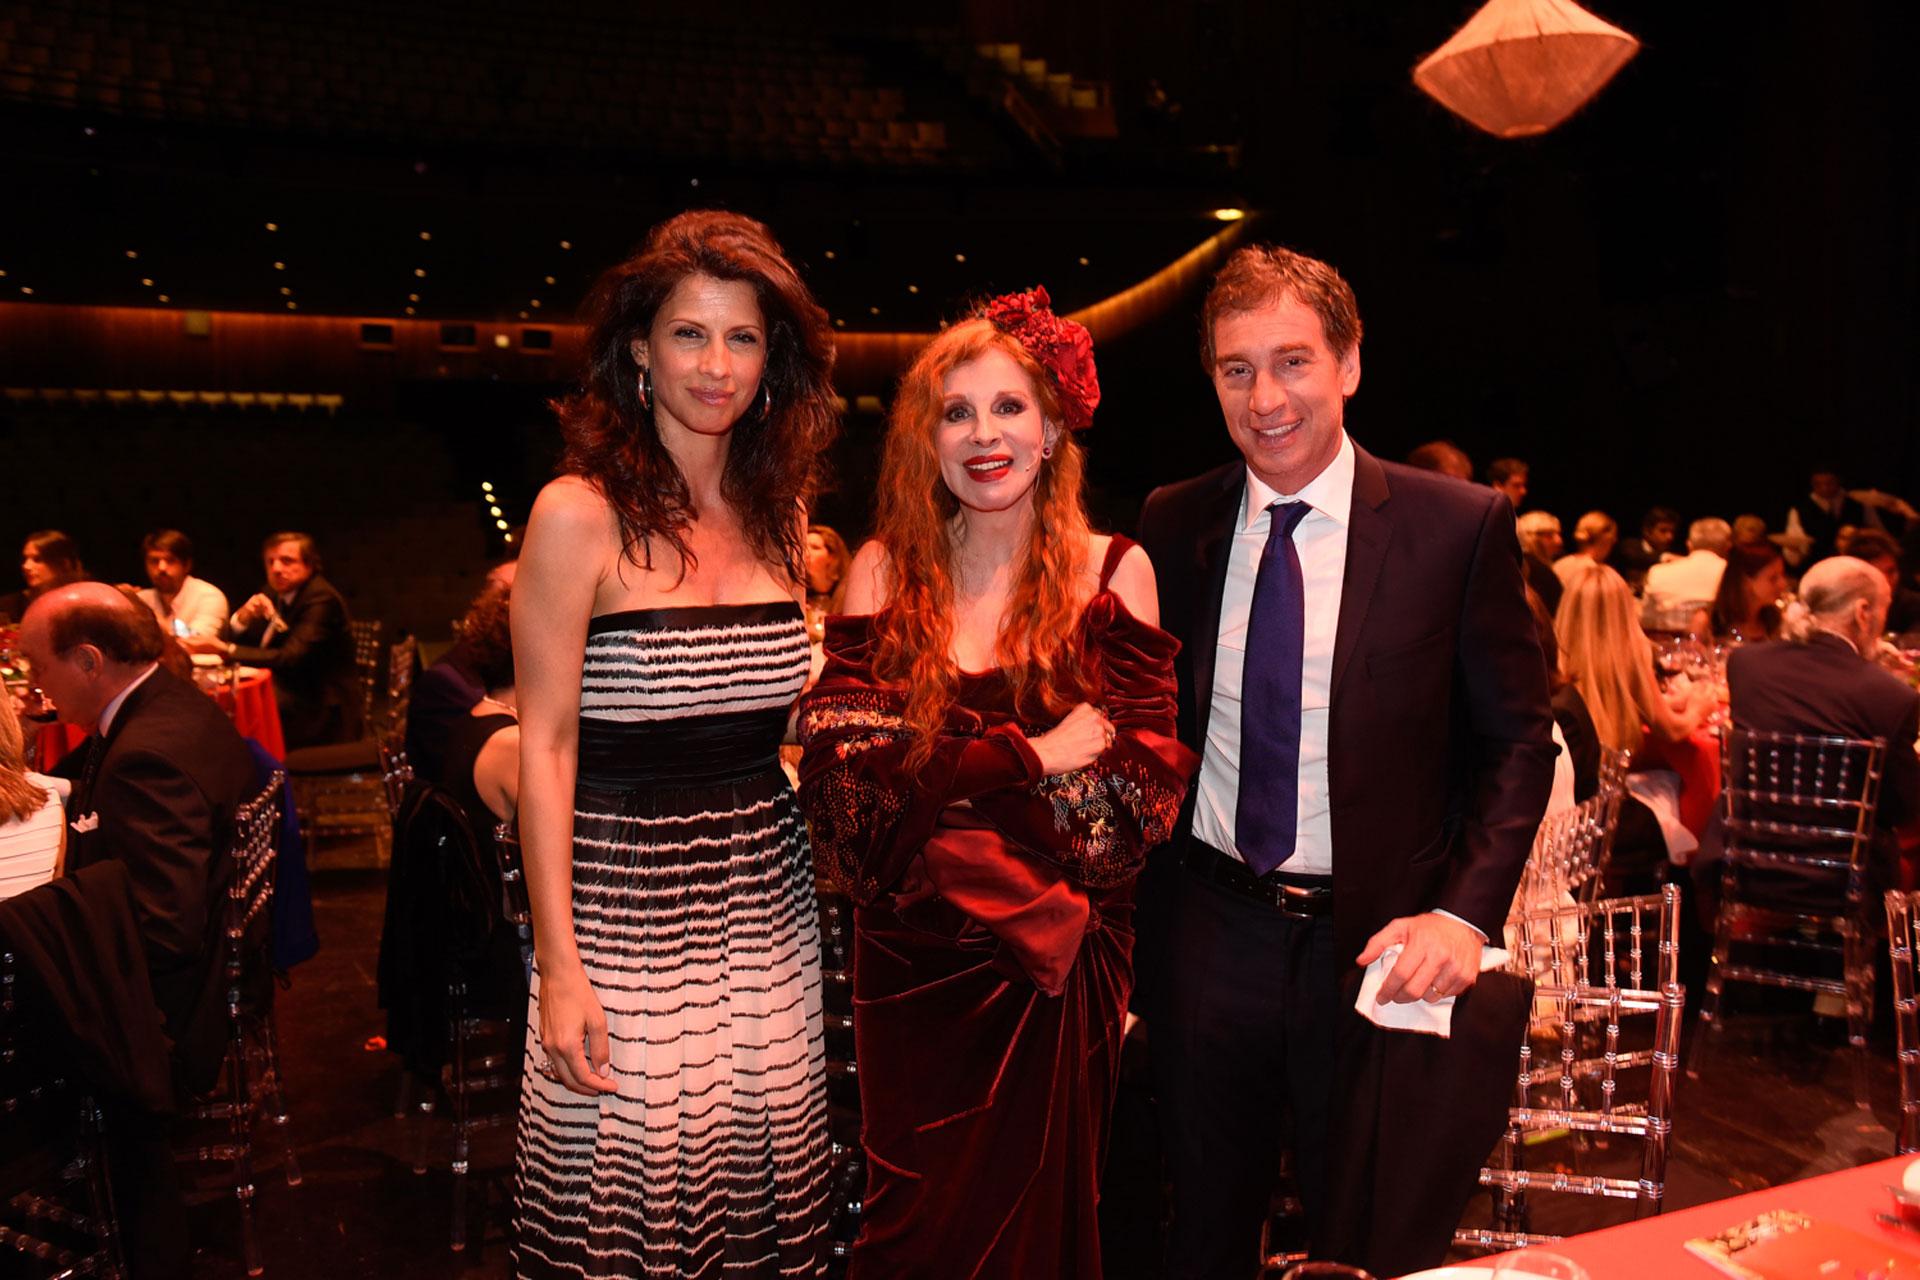 Analía Maiorana, Nacha Guevara y Diego Santilli